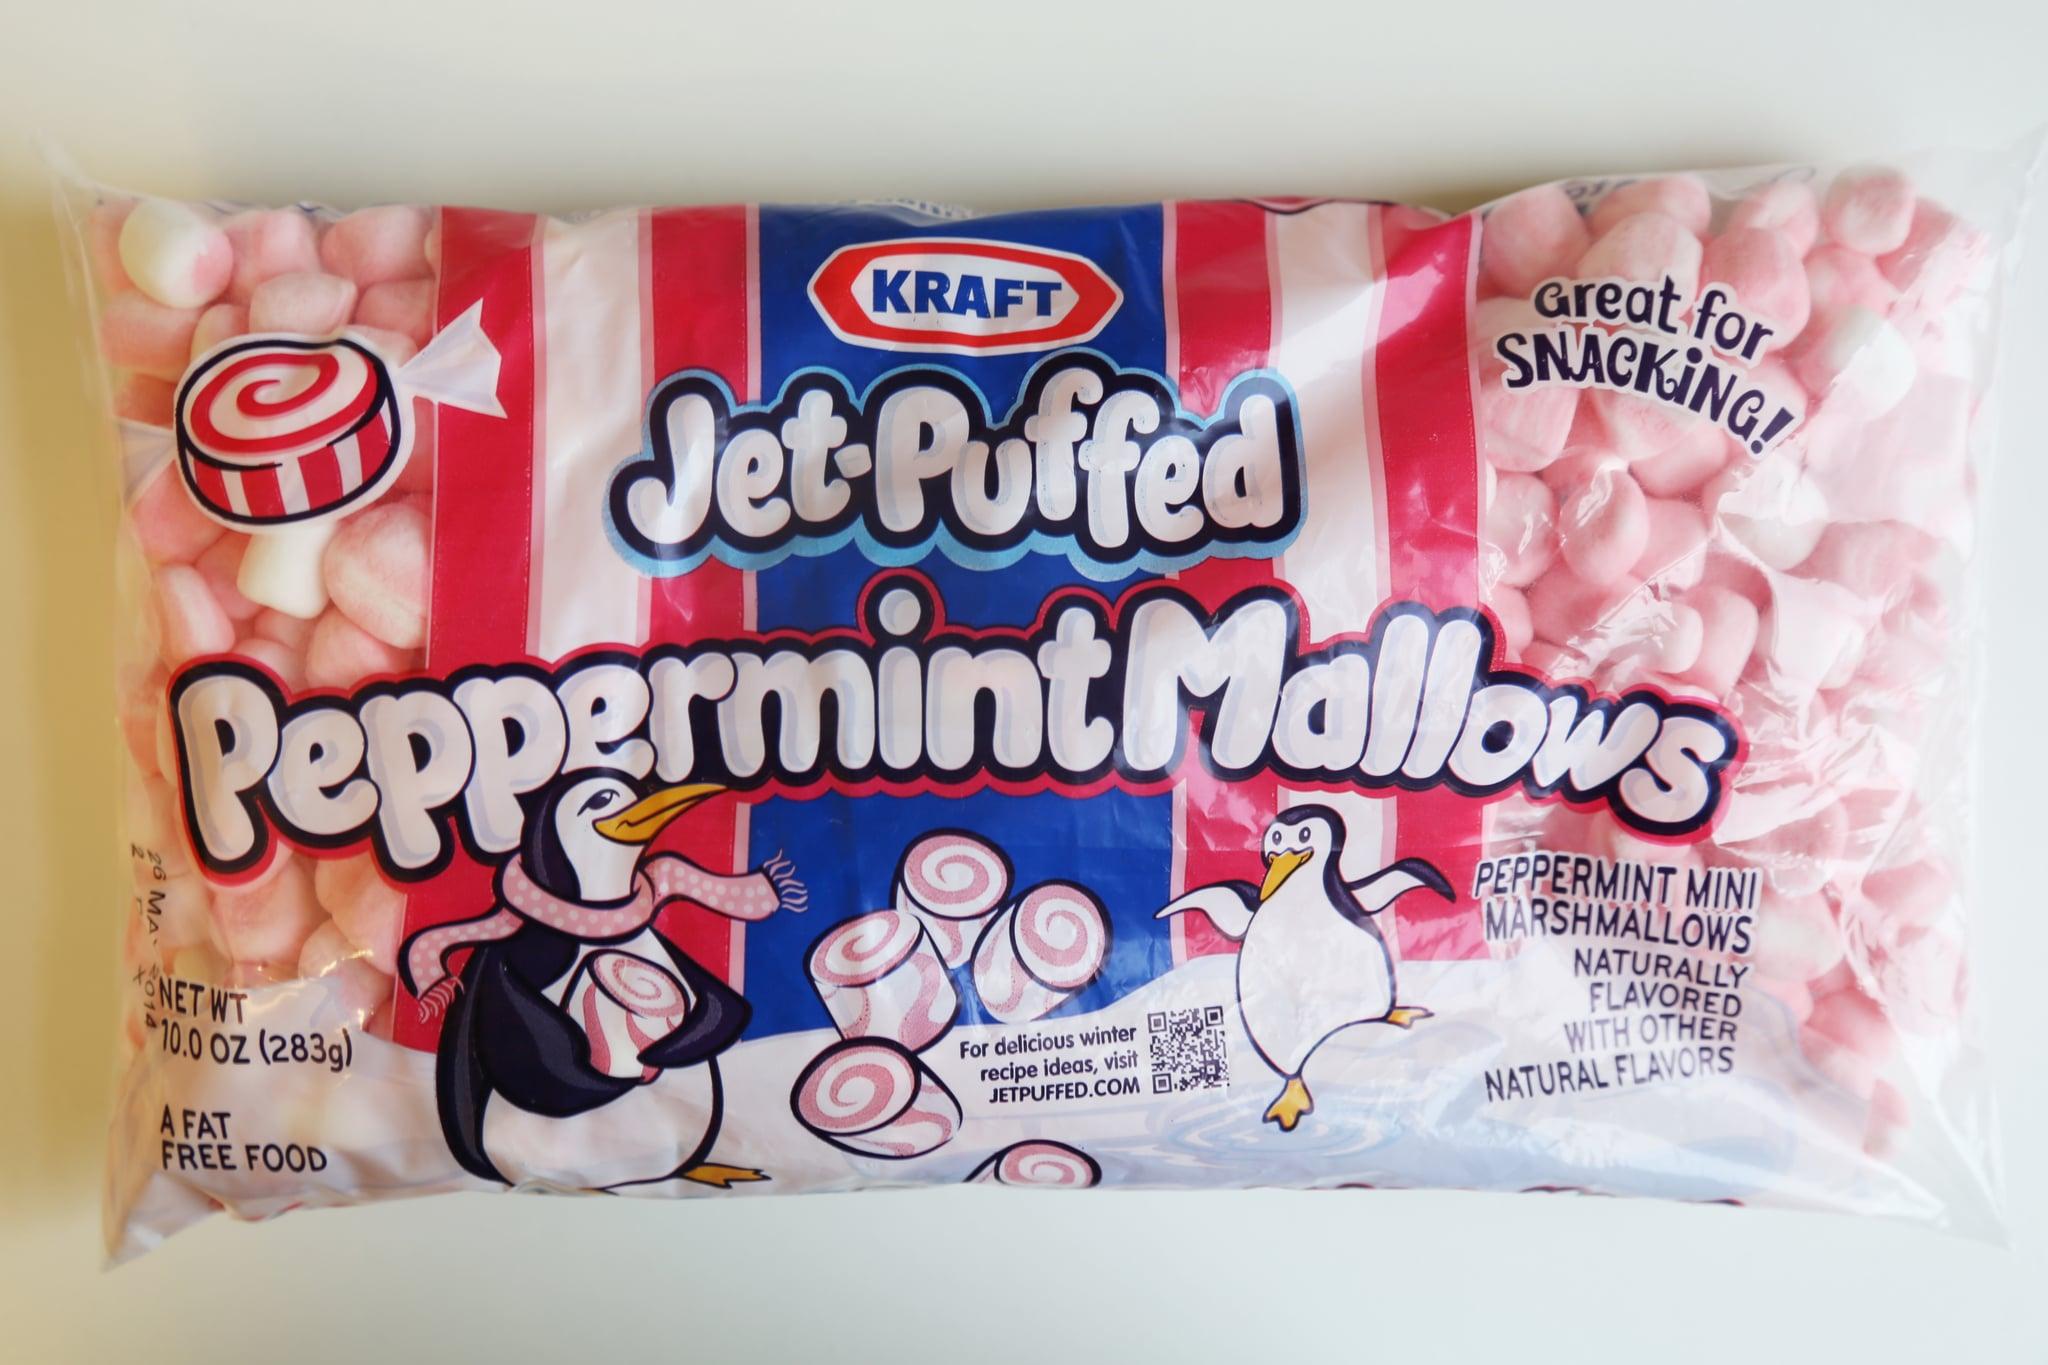 Jet-Puffed Peppermint Mallows